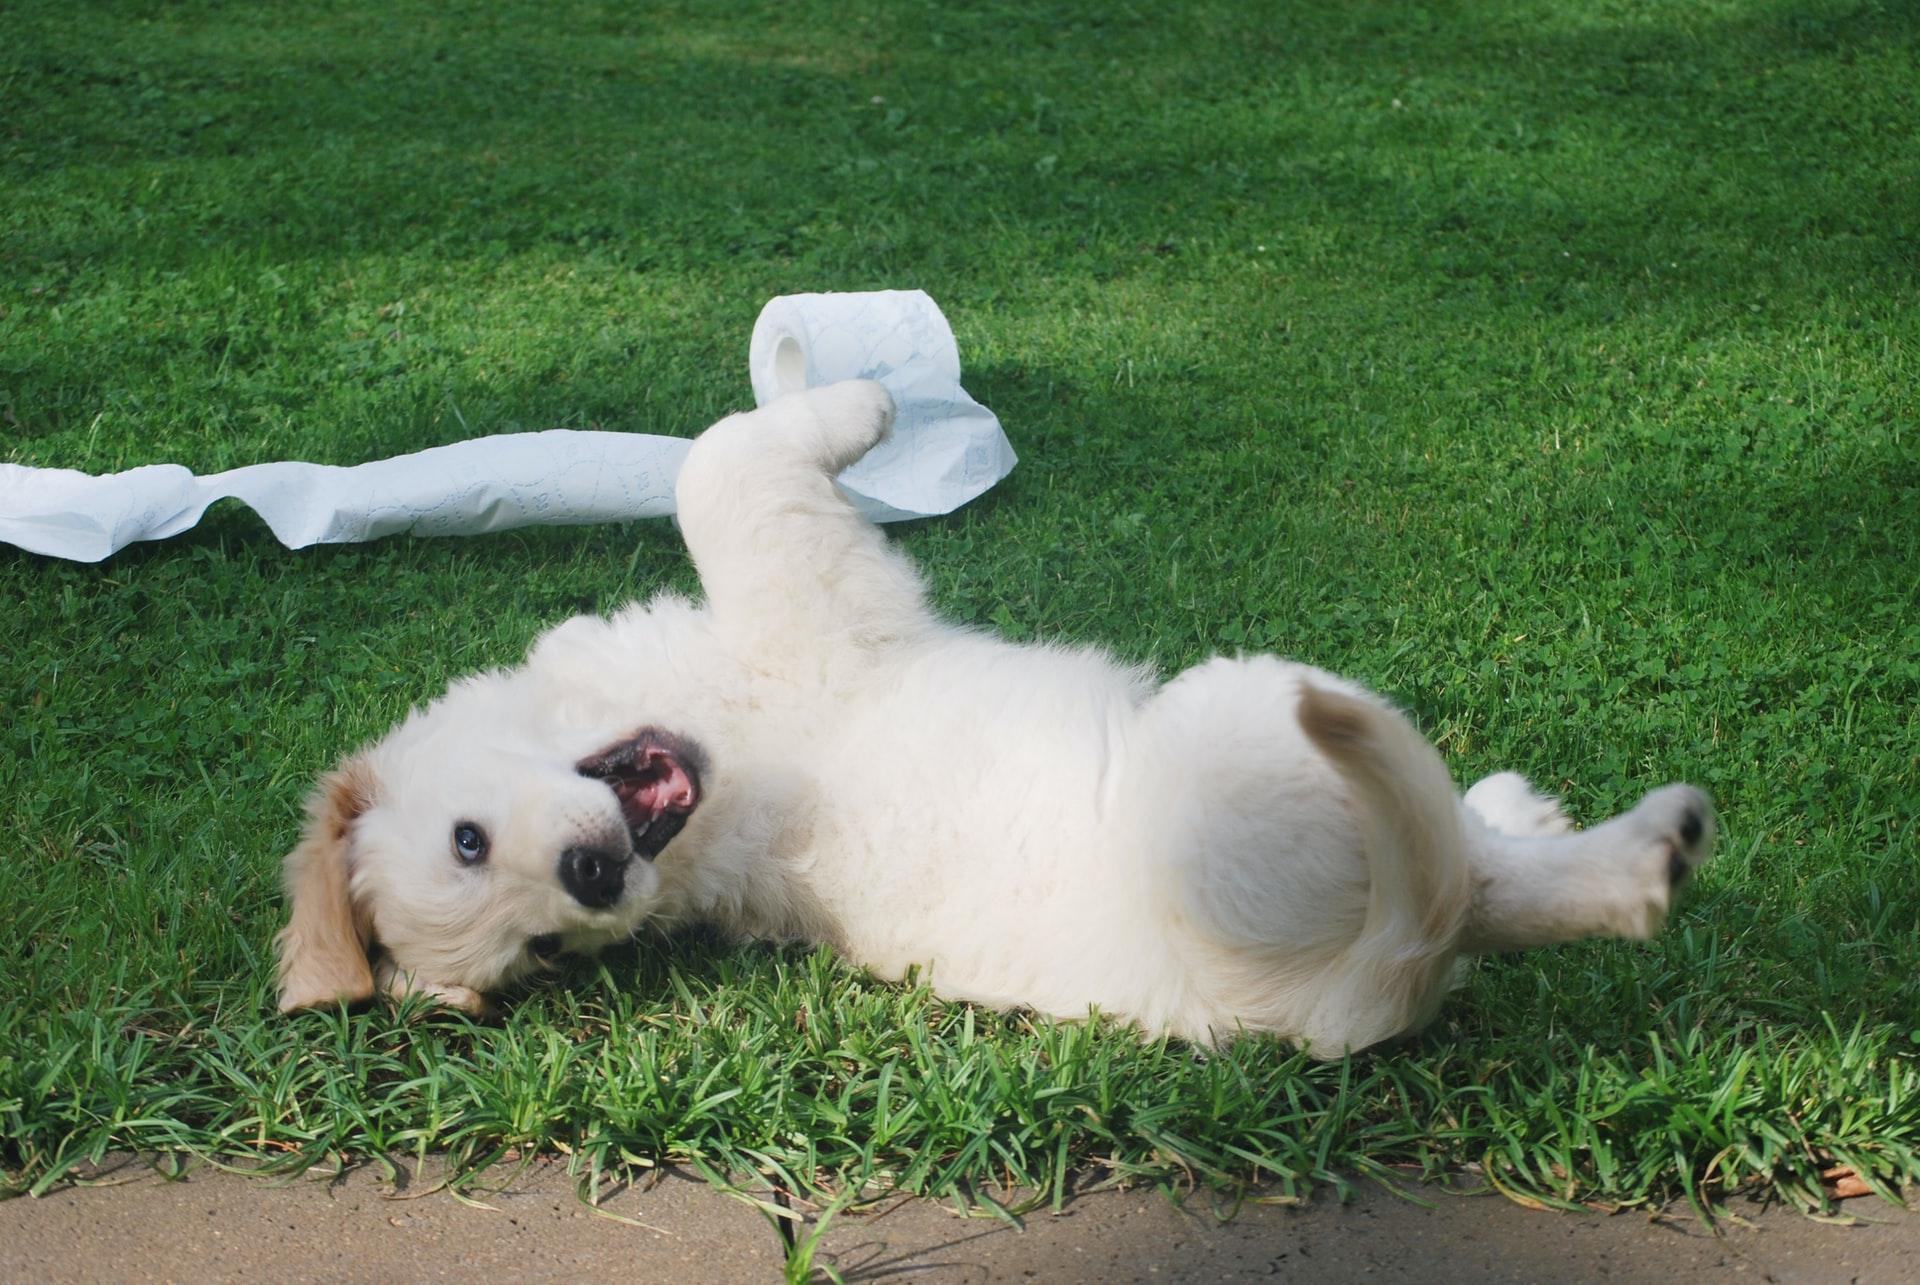 LakeDog Hundeschule- Welpen & Junghunde